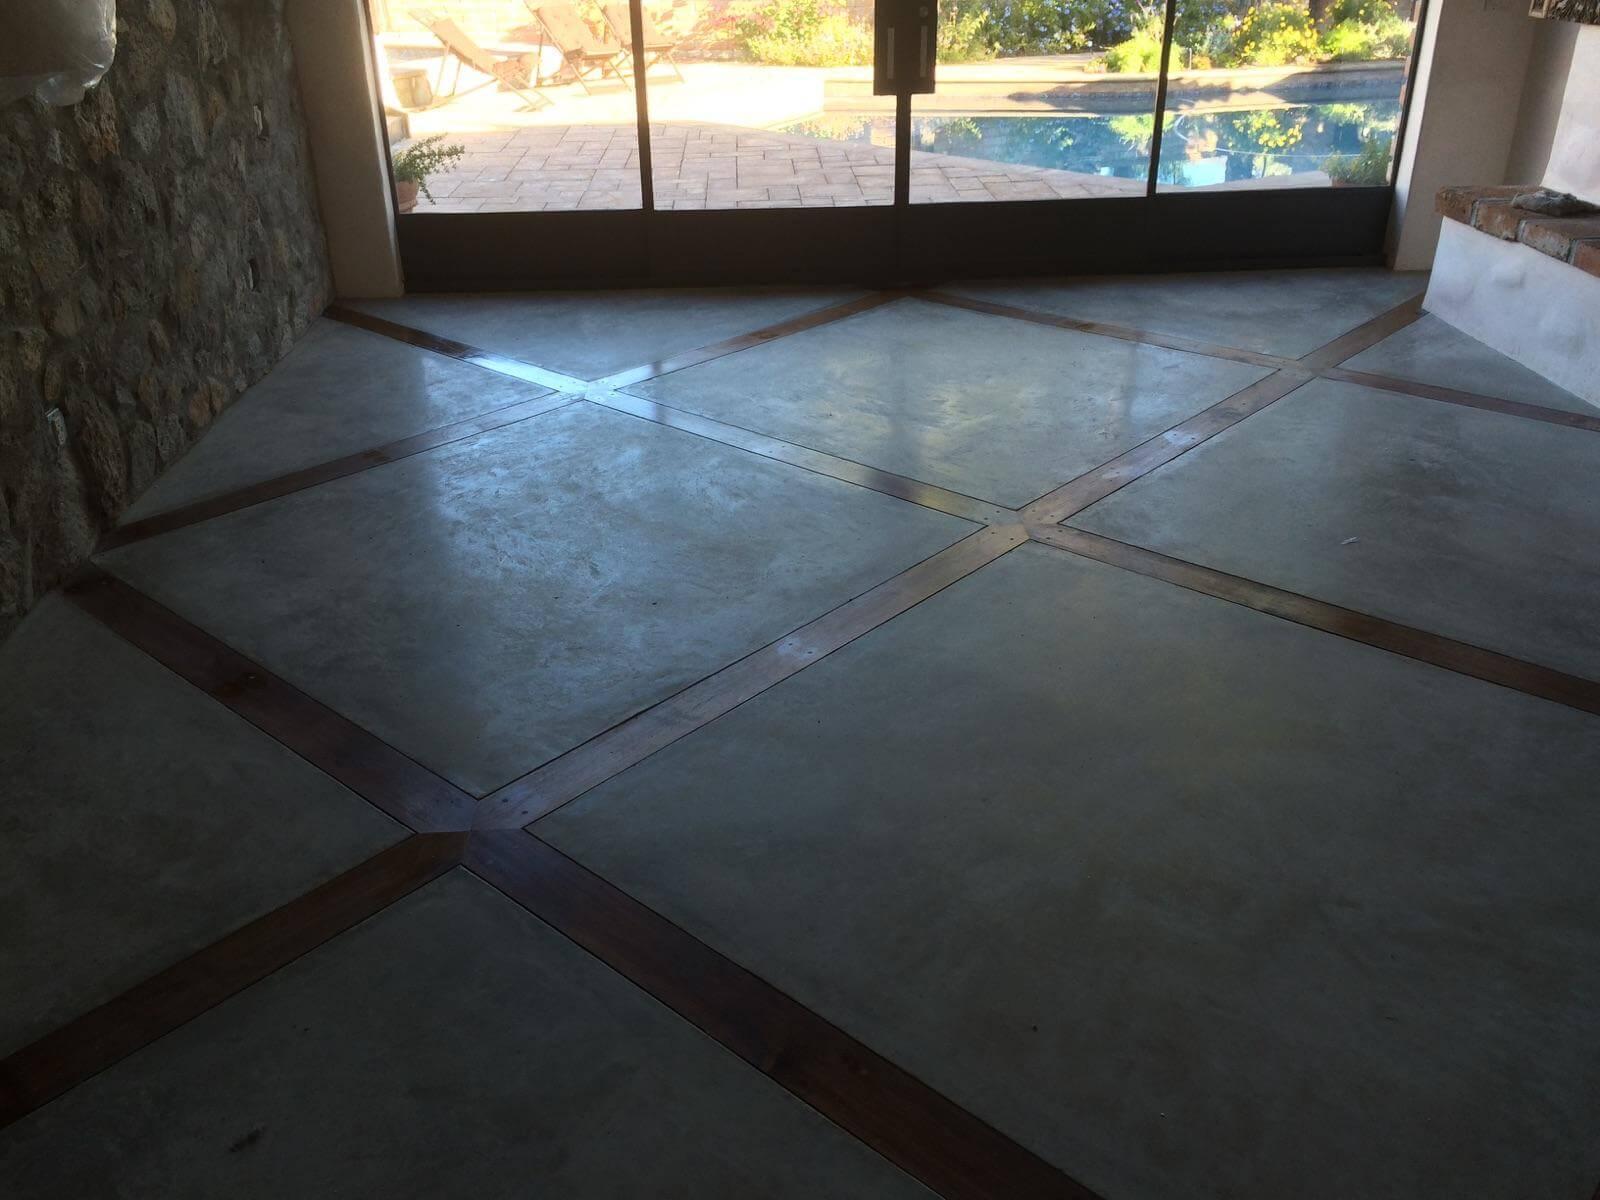 Polished Concrete House Floors With Decorative Wood Inlay Optimum Concrete Llc